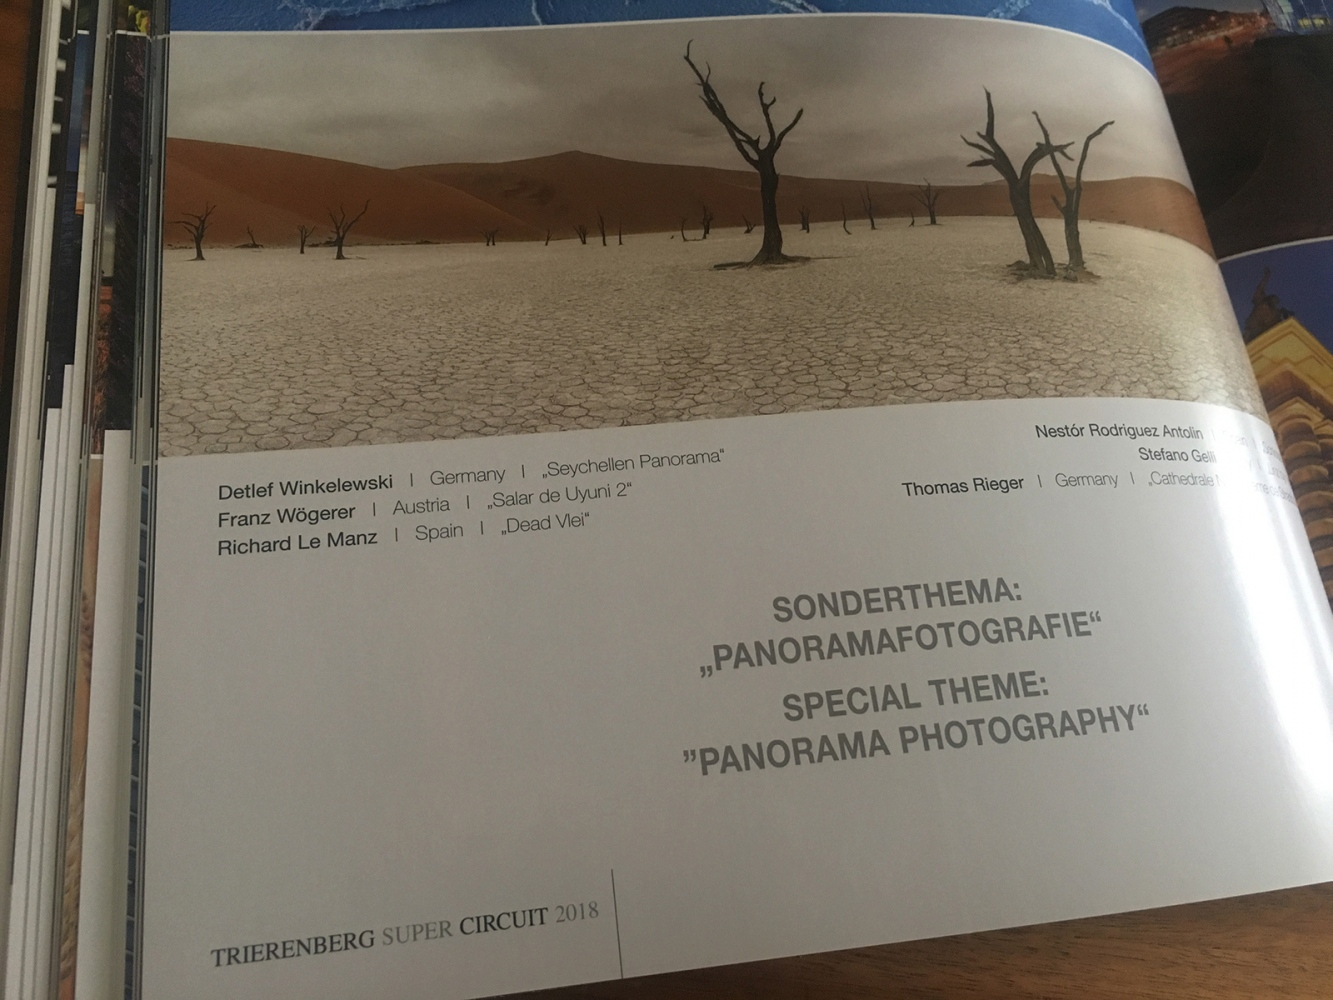 Photography image - Loading IMG_4177-Trierenberg.jpg